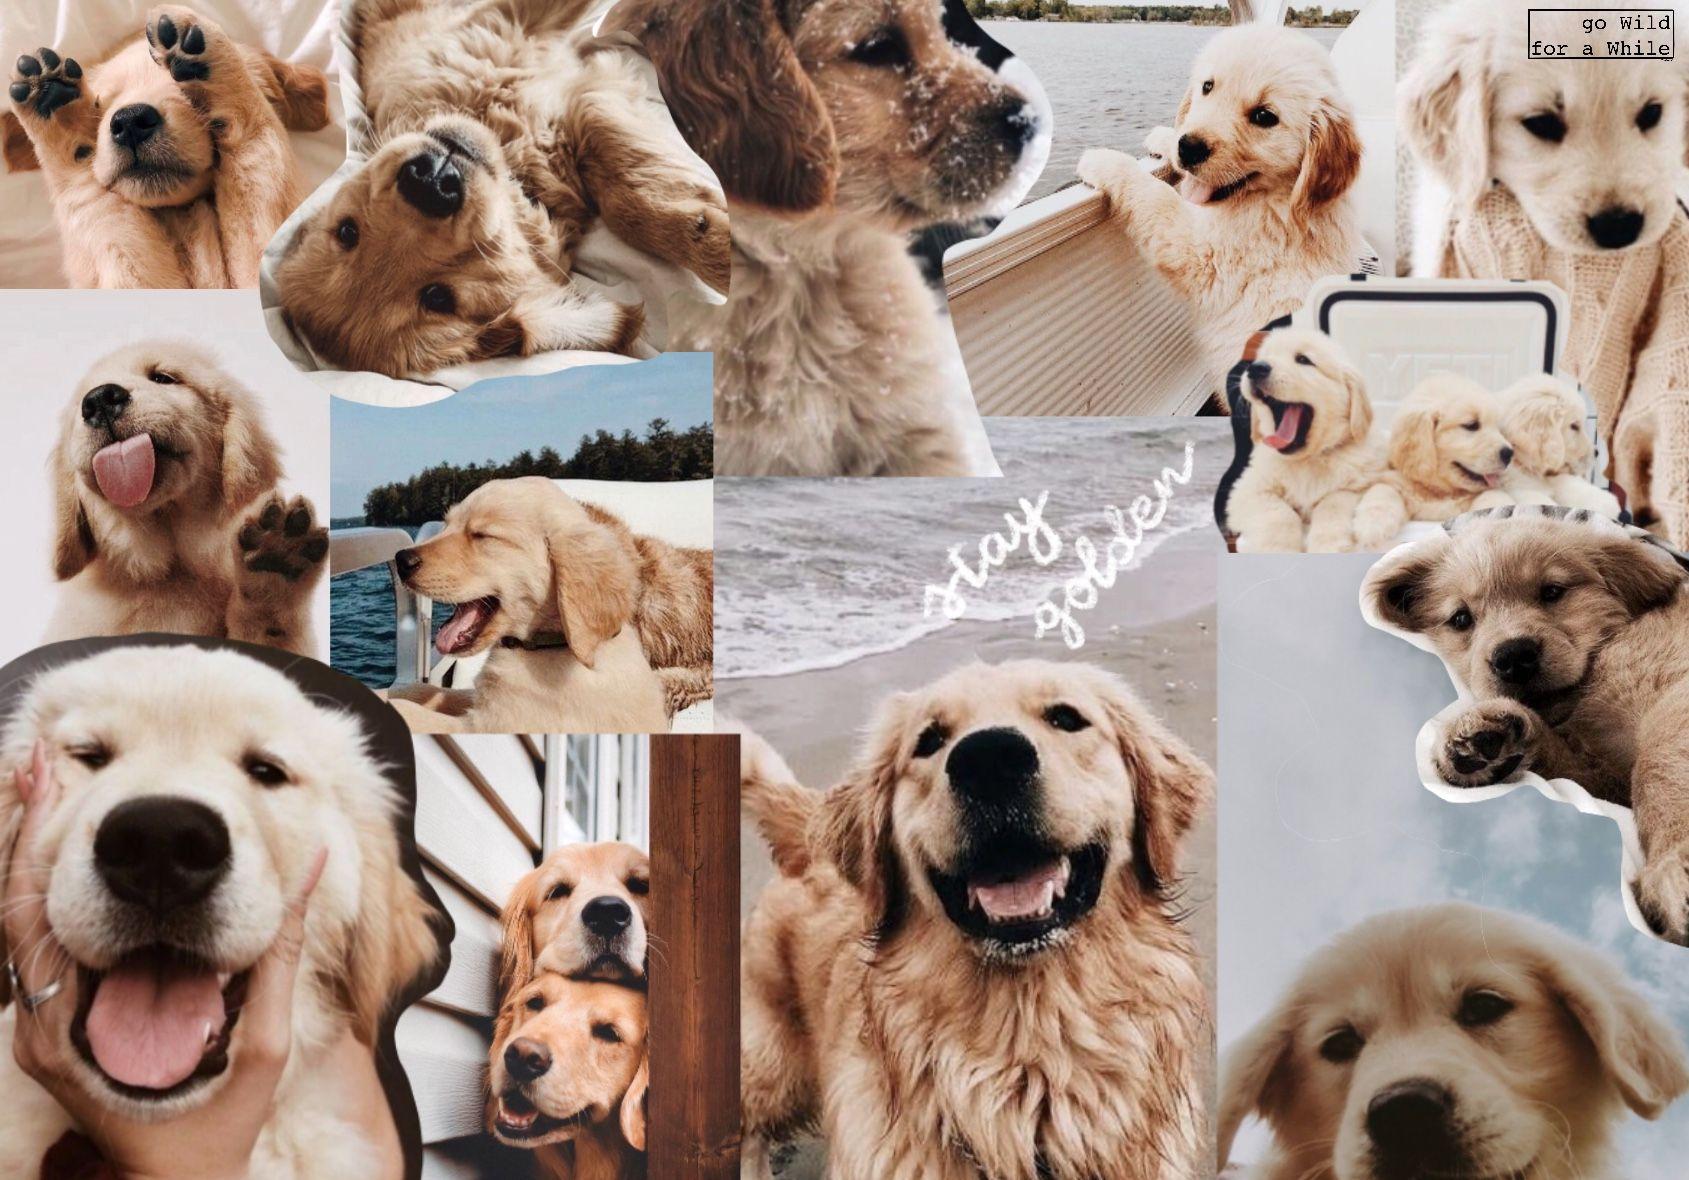 Stay Golden Golden Retriever Wallpaper Golden Retriever Custom Dog